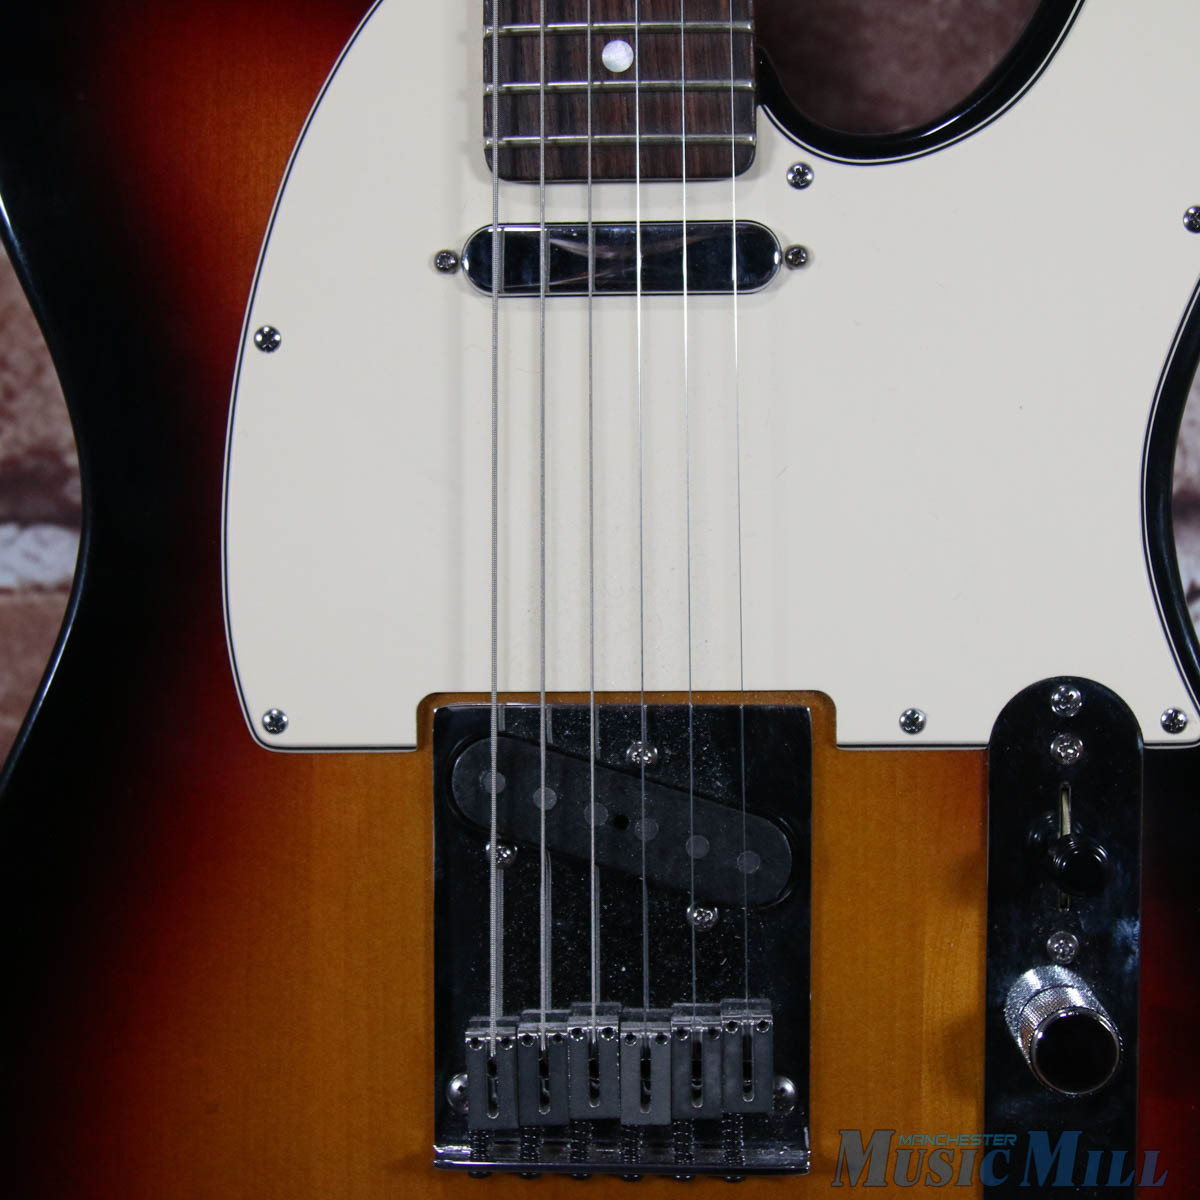 2006 Fender Diamond 60th Anniversary American Telecaster 3 Color Sunburst